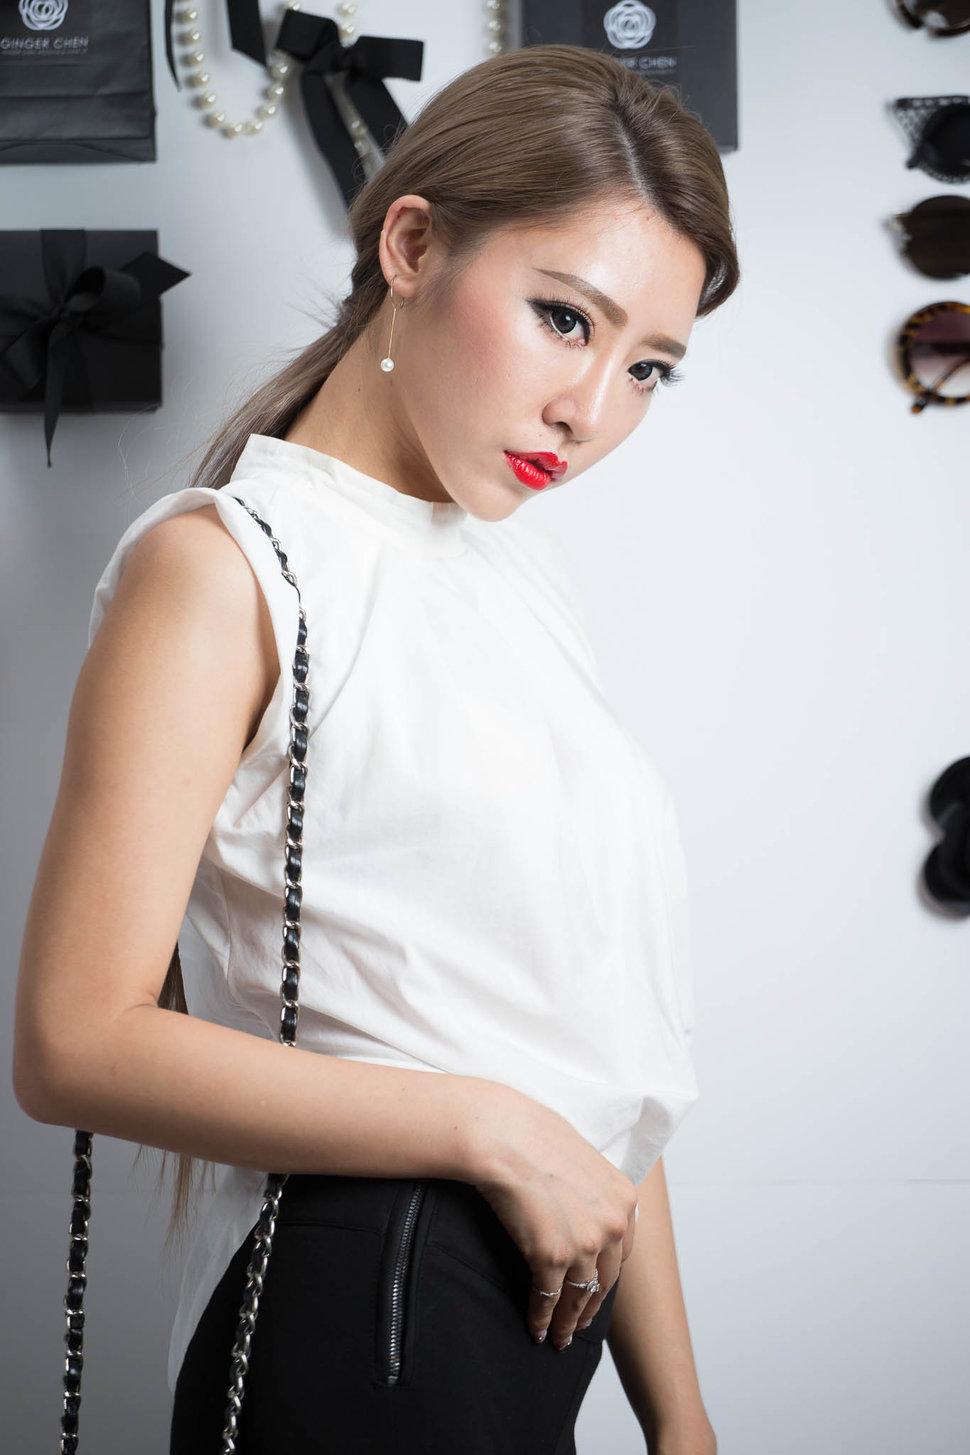 18PHOTO形象照-唯我(編號:409899) - 18PHOTO 婚紗影像攝影工作室 - 結婚吧